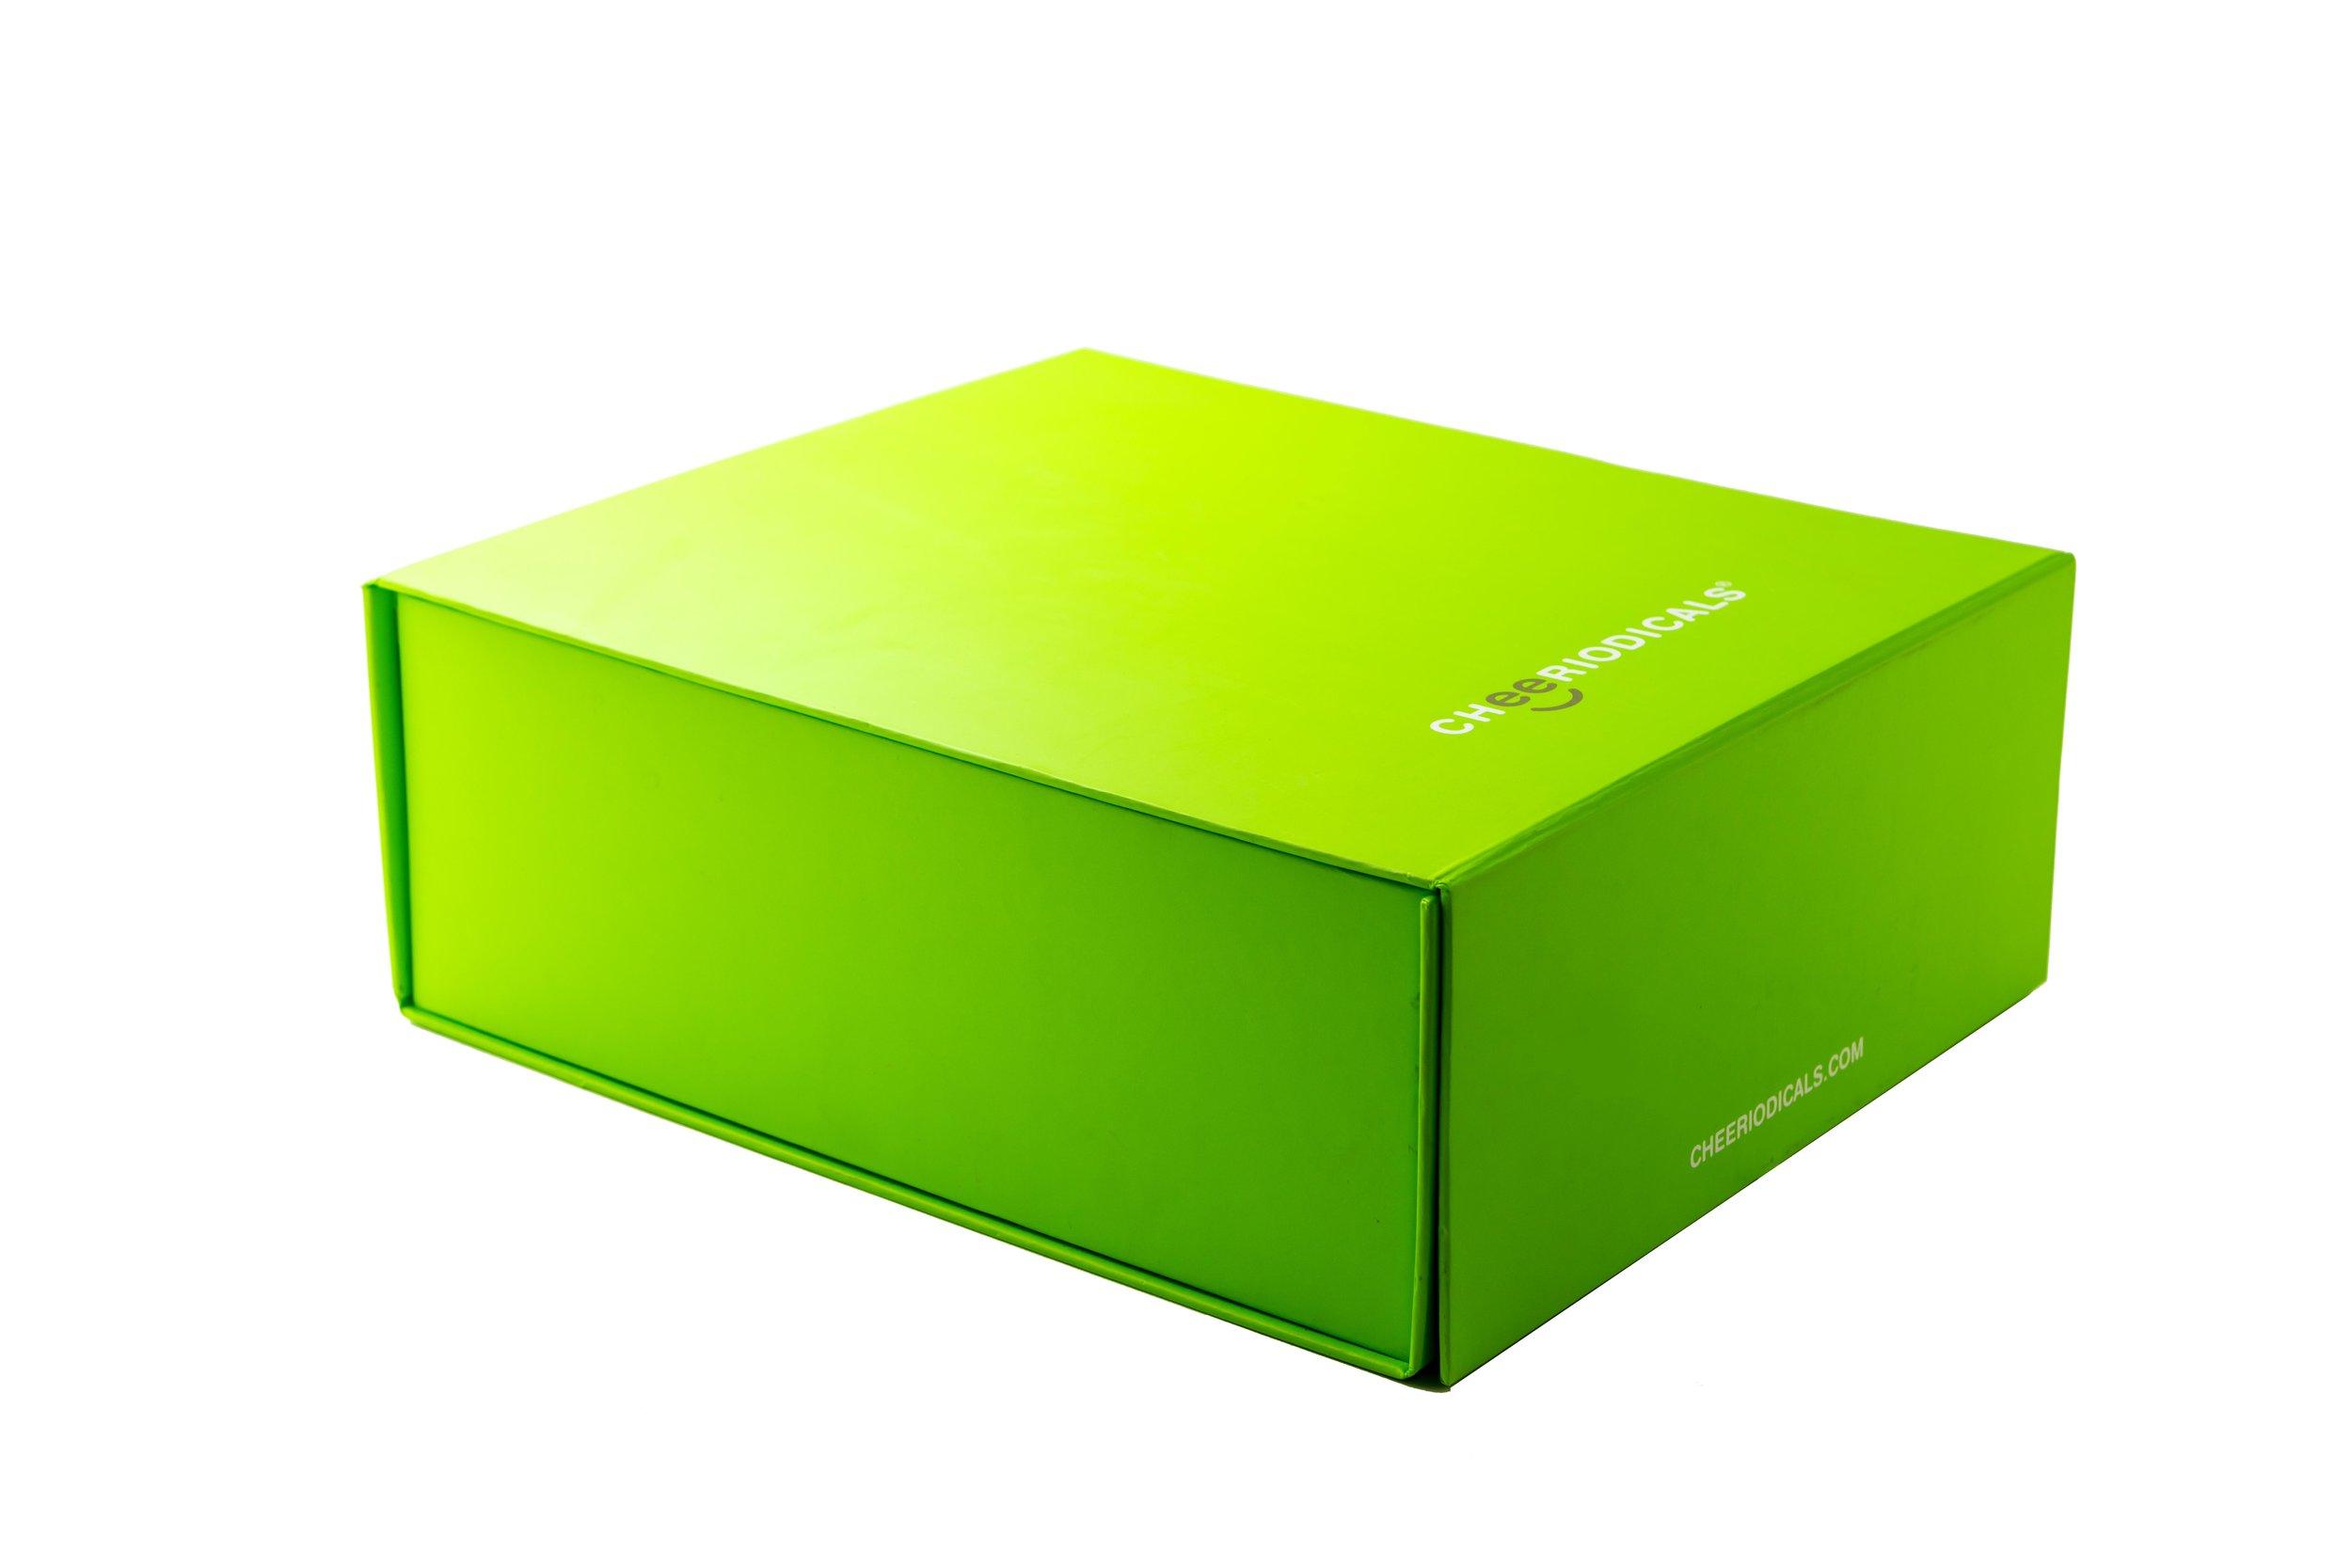 luxury-rigid-set-up-box-manufacturer-in-china-korea.jpg